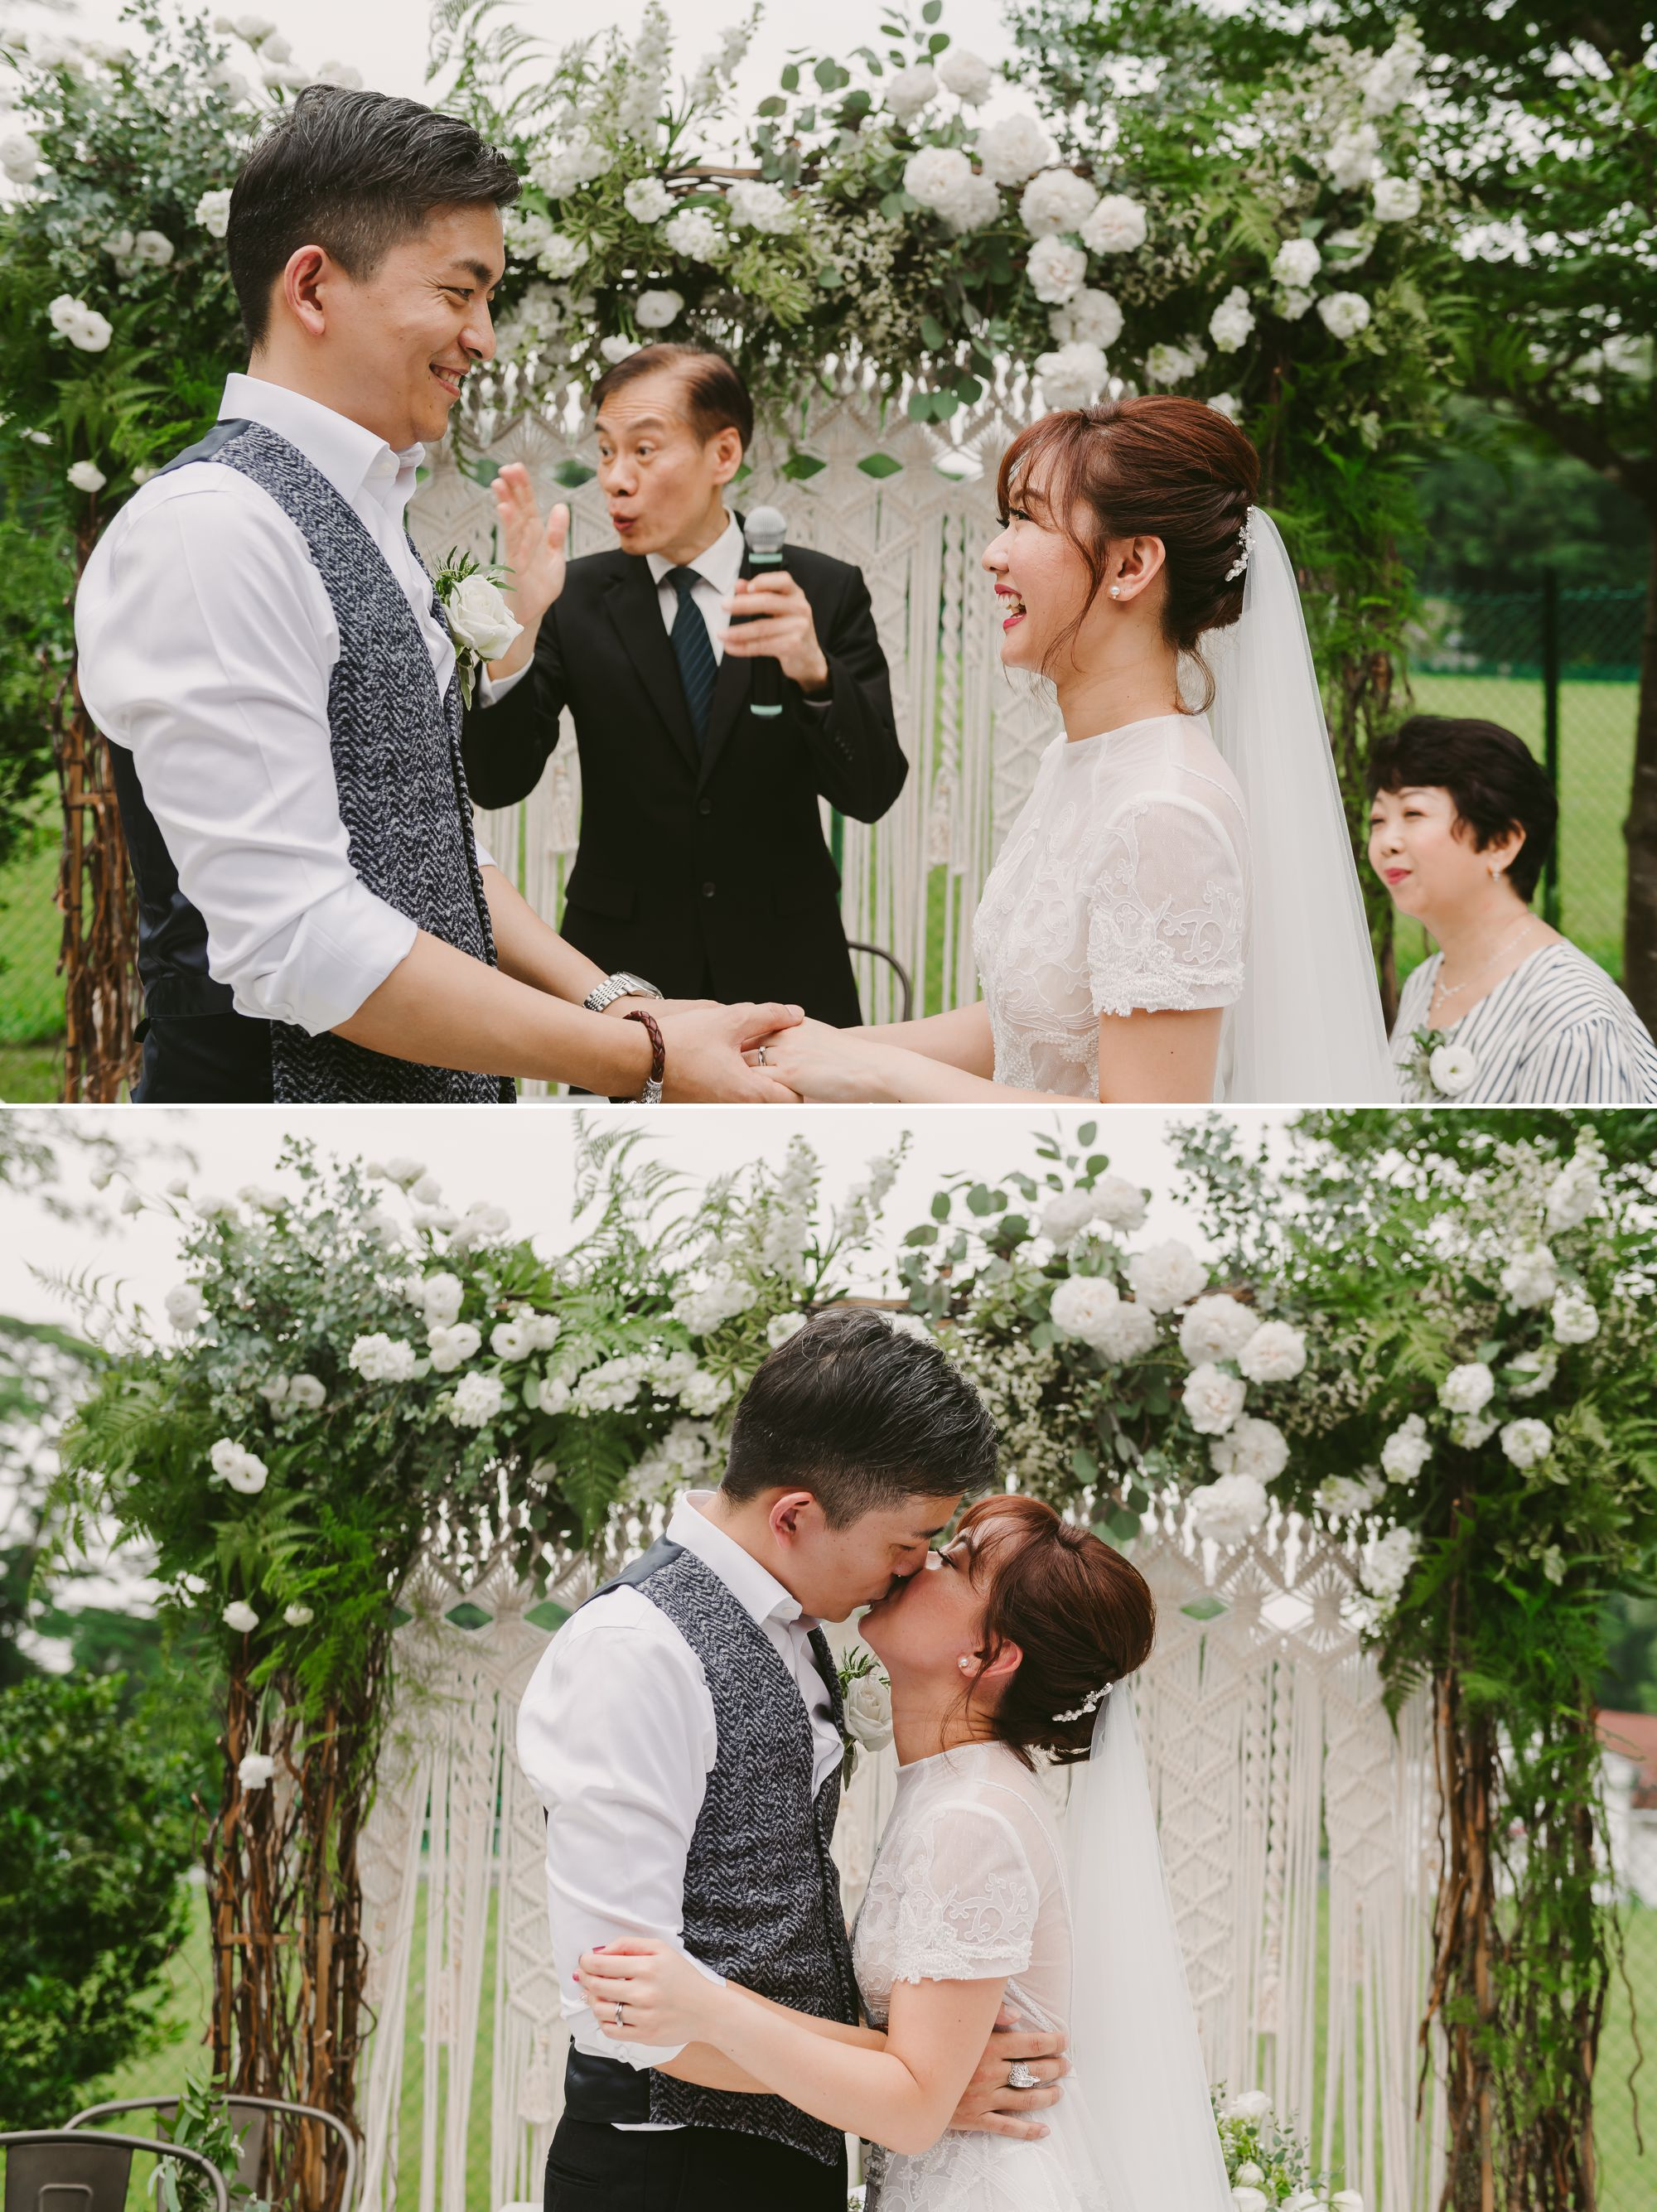 wedding_photography 19.jpg